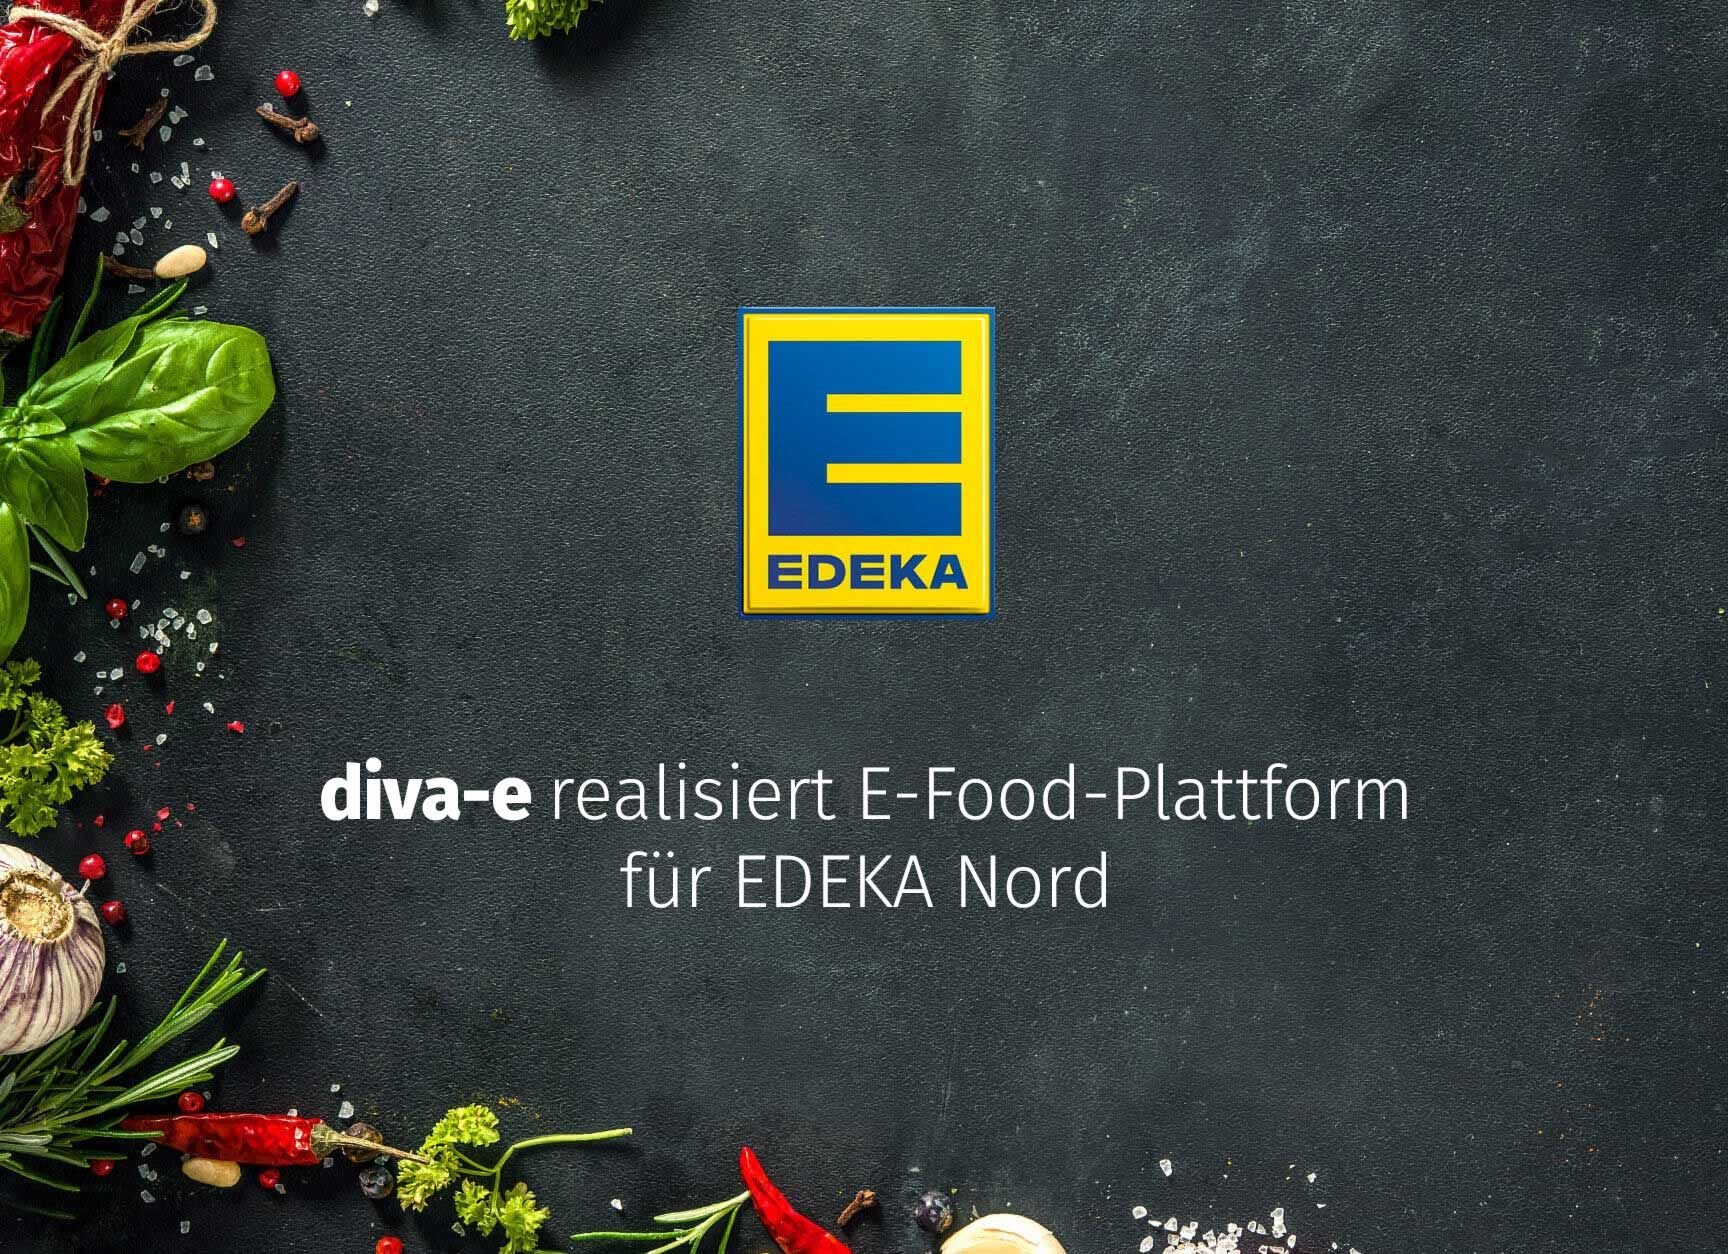 E-Food-Plattform für EDEKA Nord